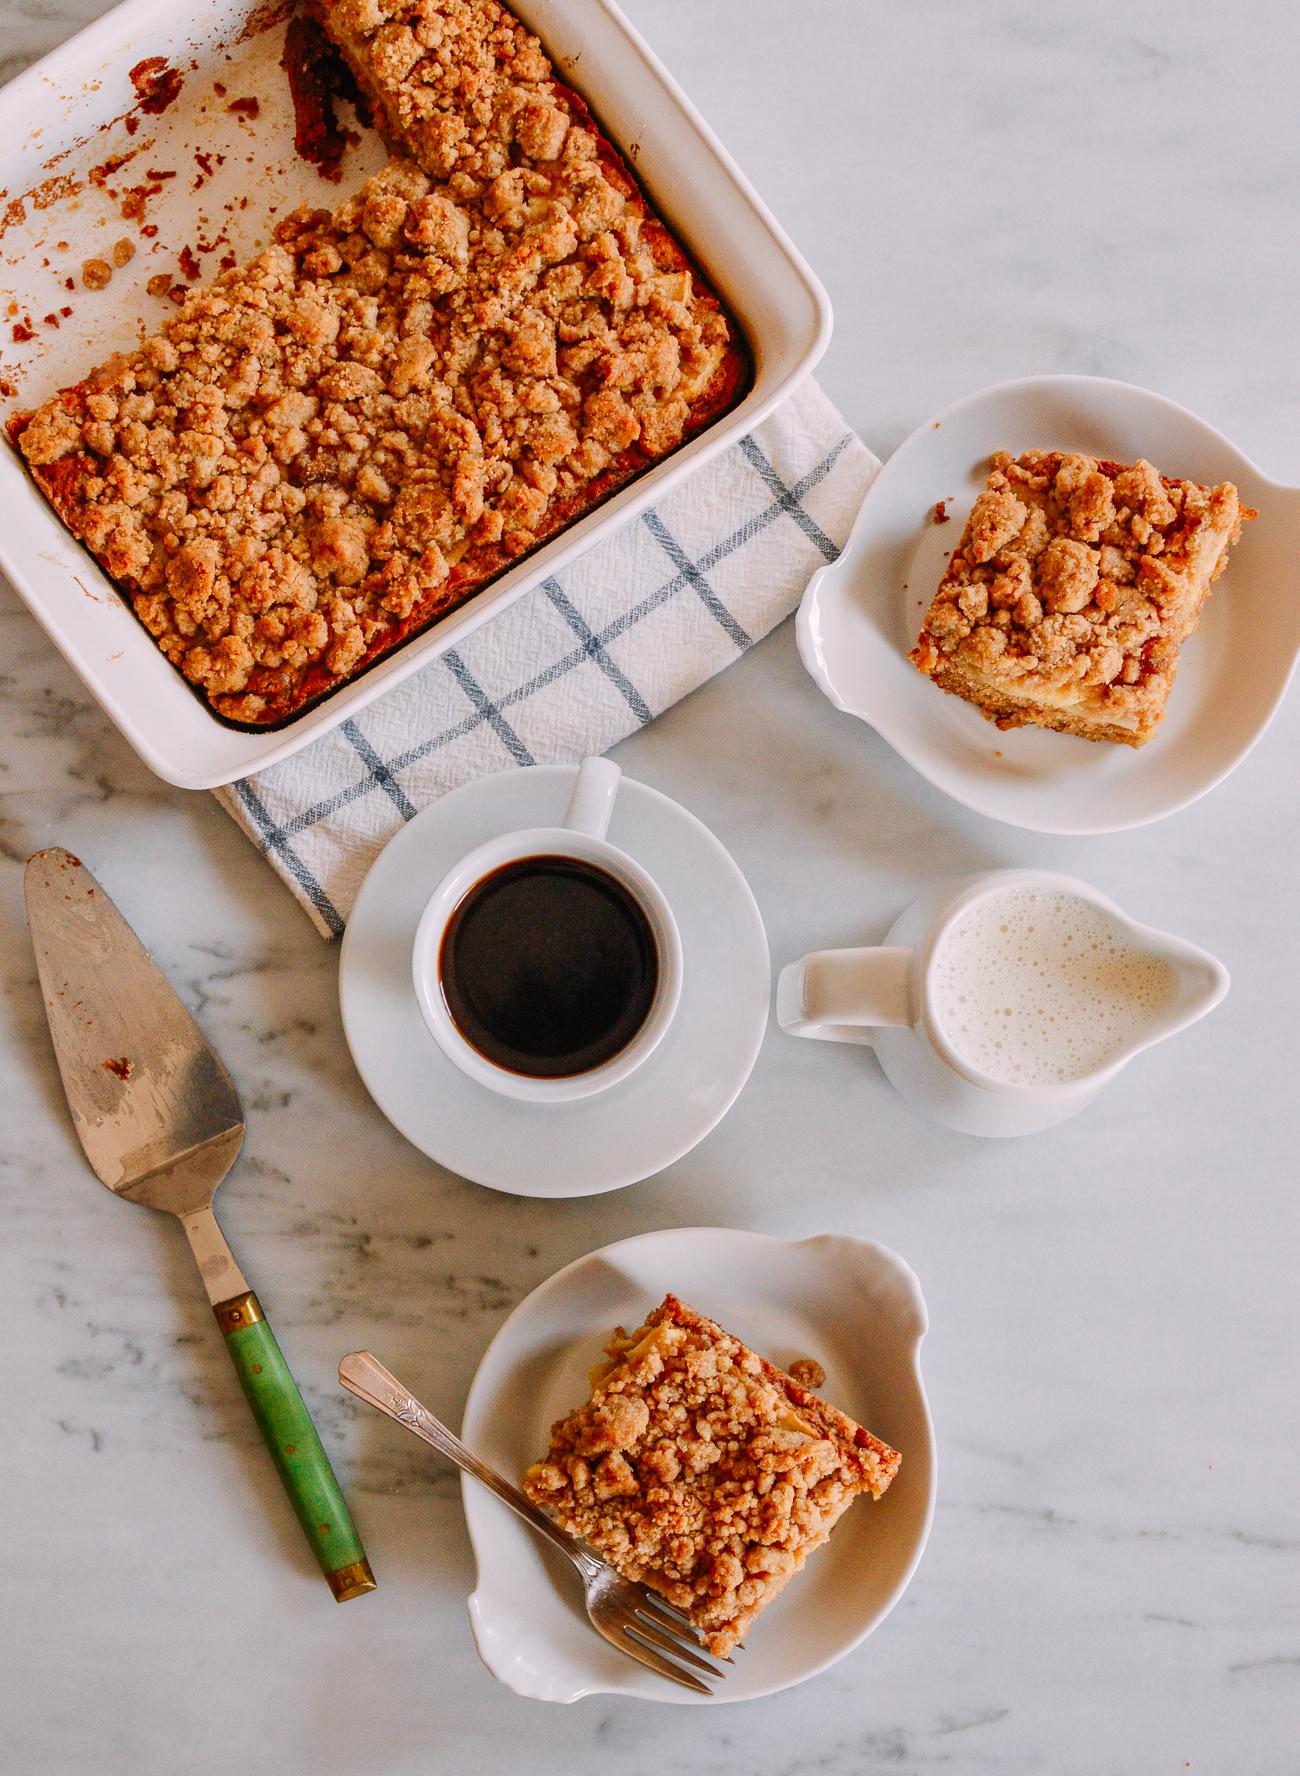 Sliced apple cinnamon coffee cake with cake server and coffee